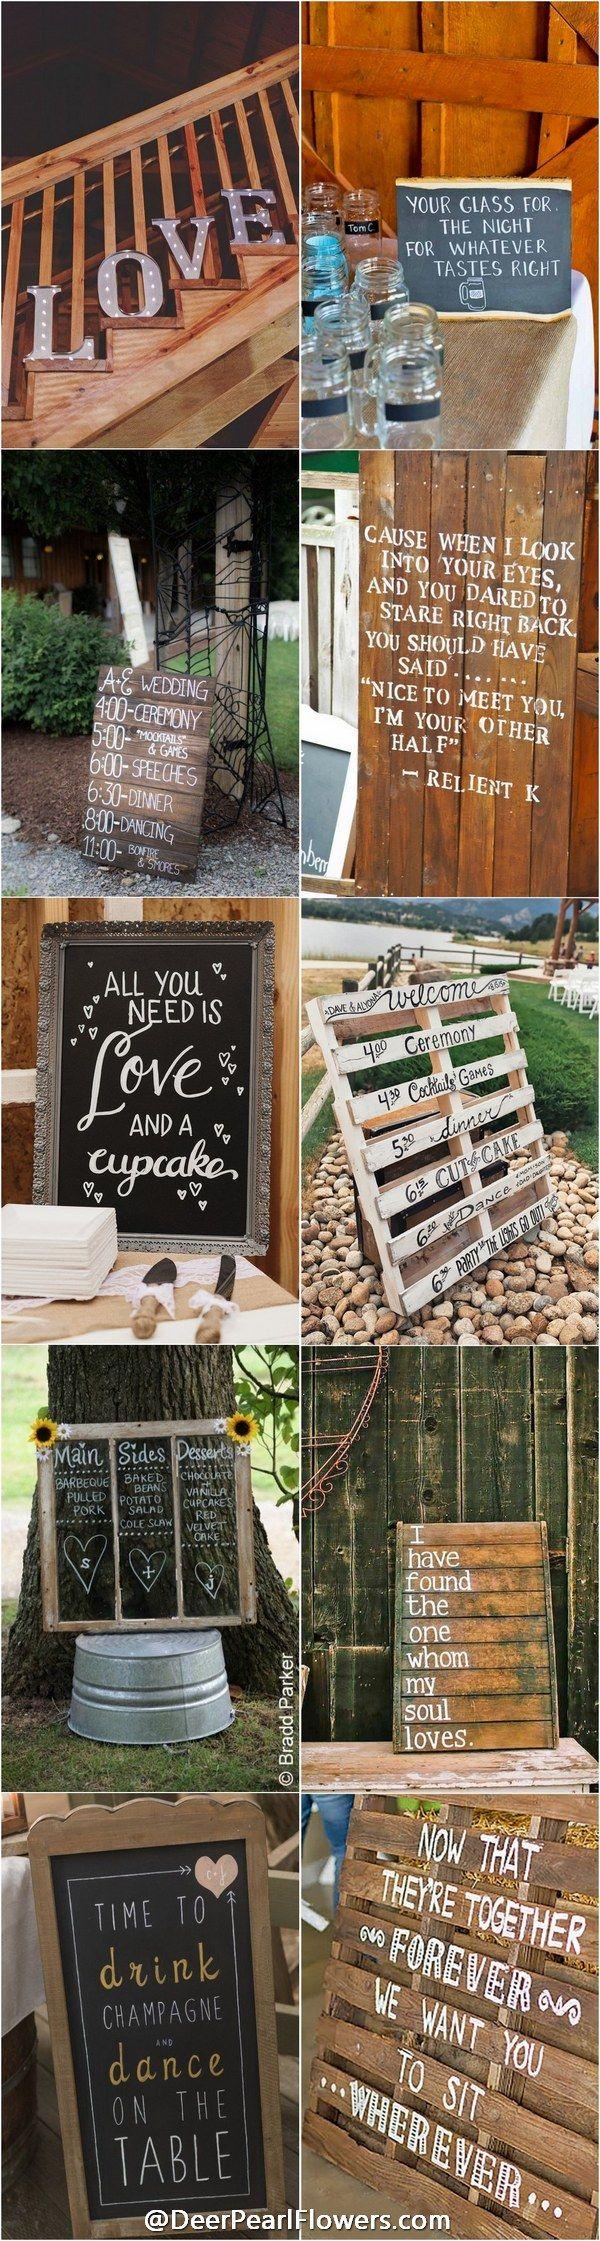 Rustic wedding signs - rustic country wedding ideas / http://www.deerpearlflowers.com/30-rustic-wedding-signs-ideas-for-weddings/